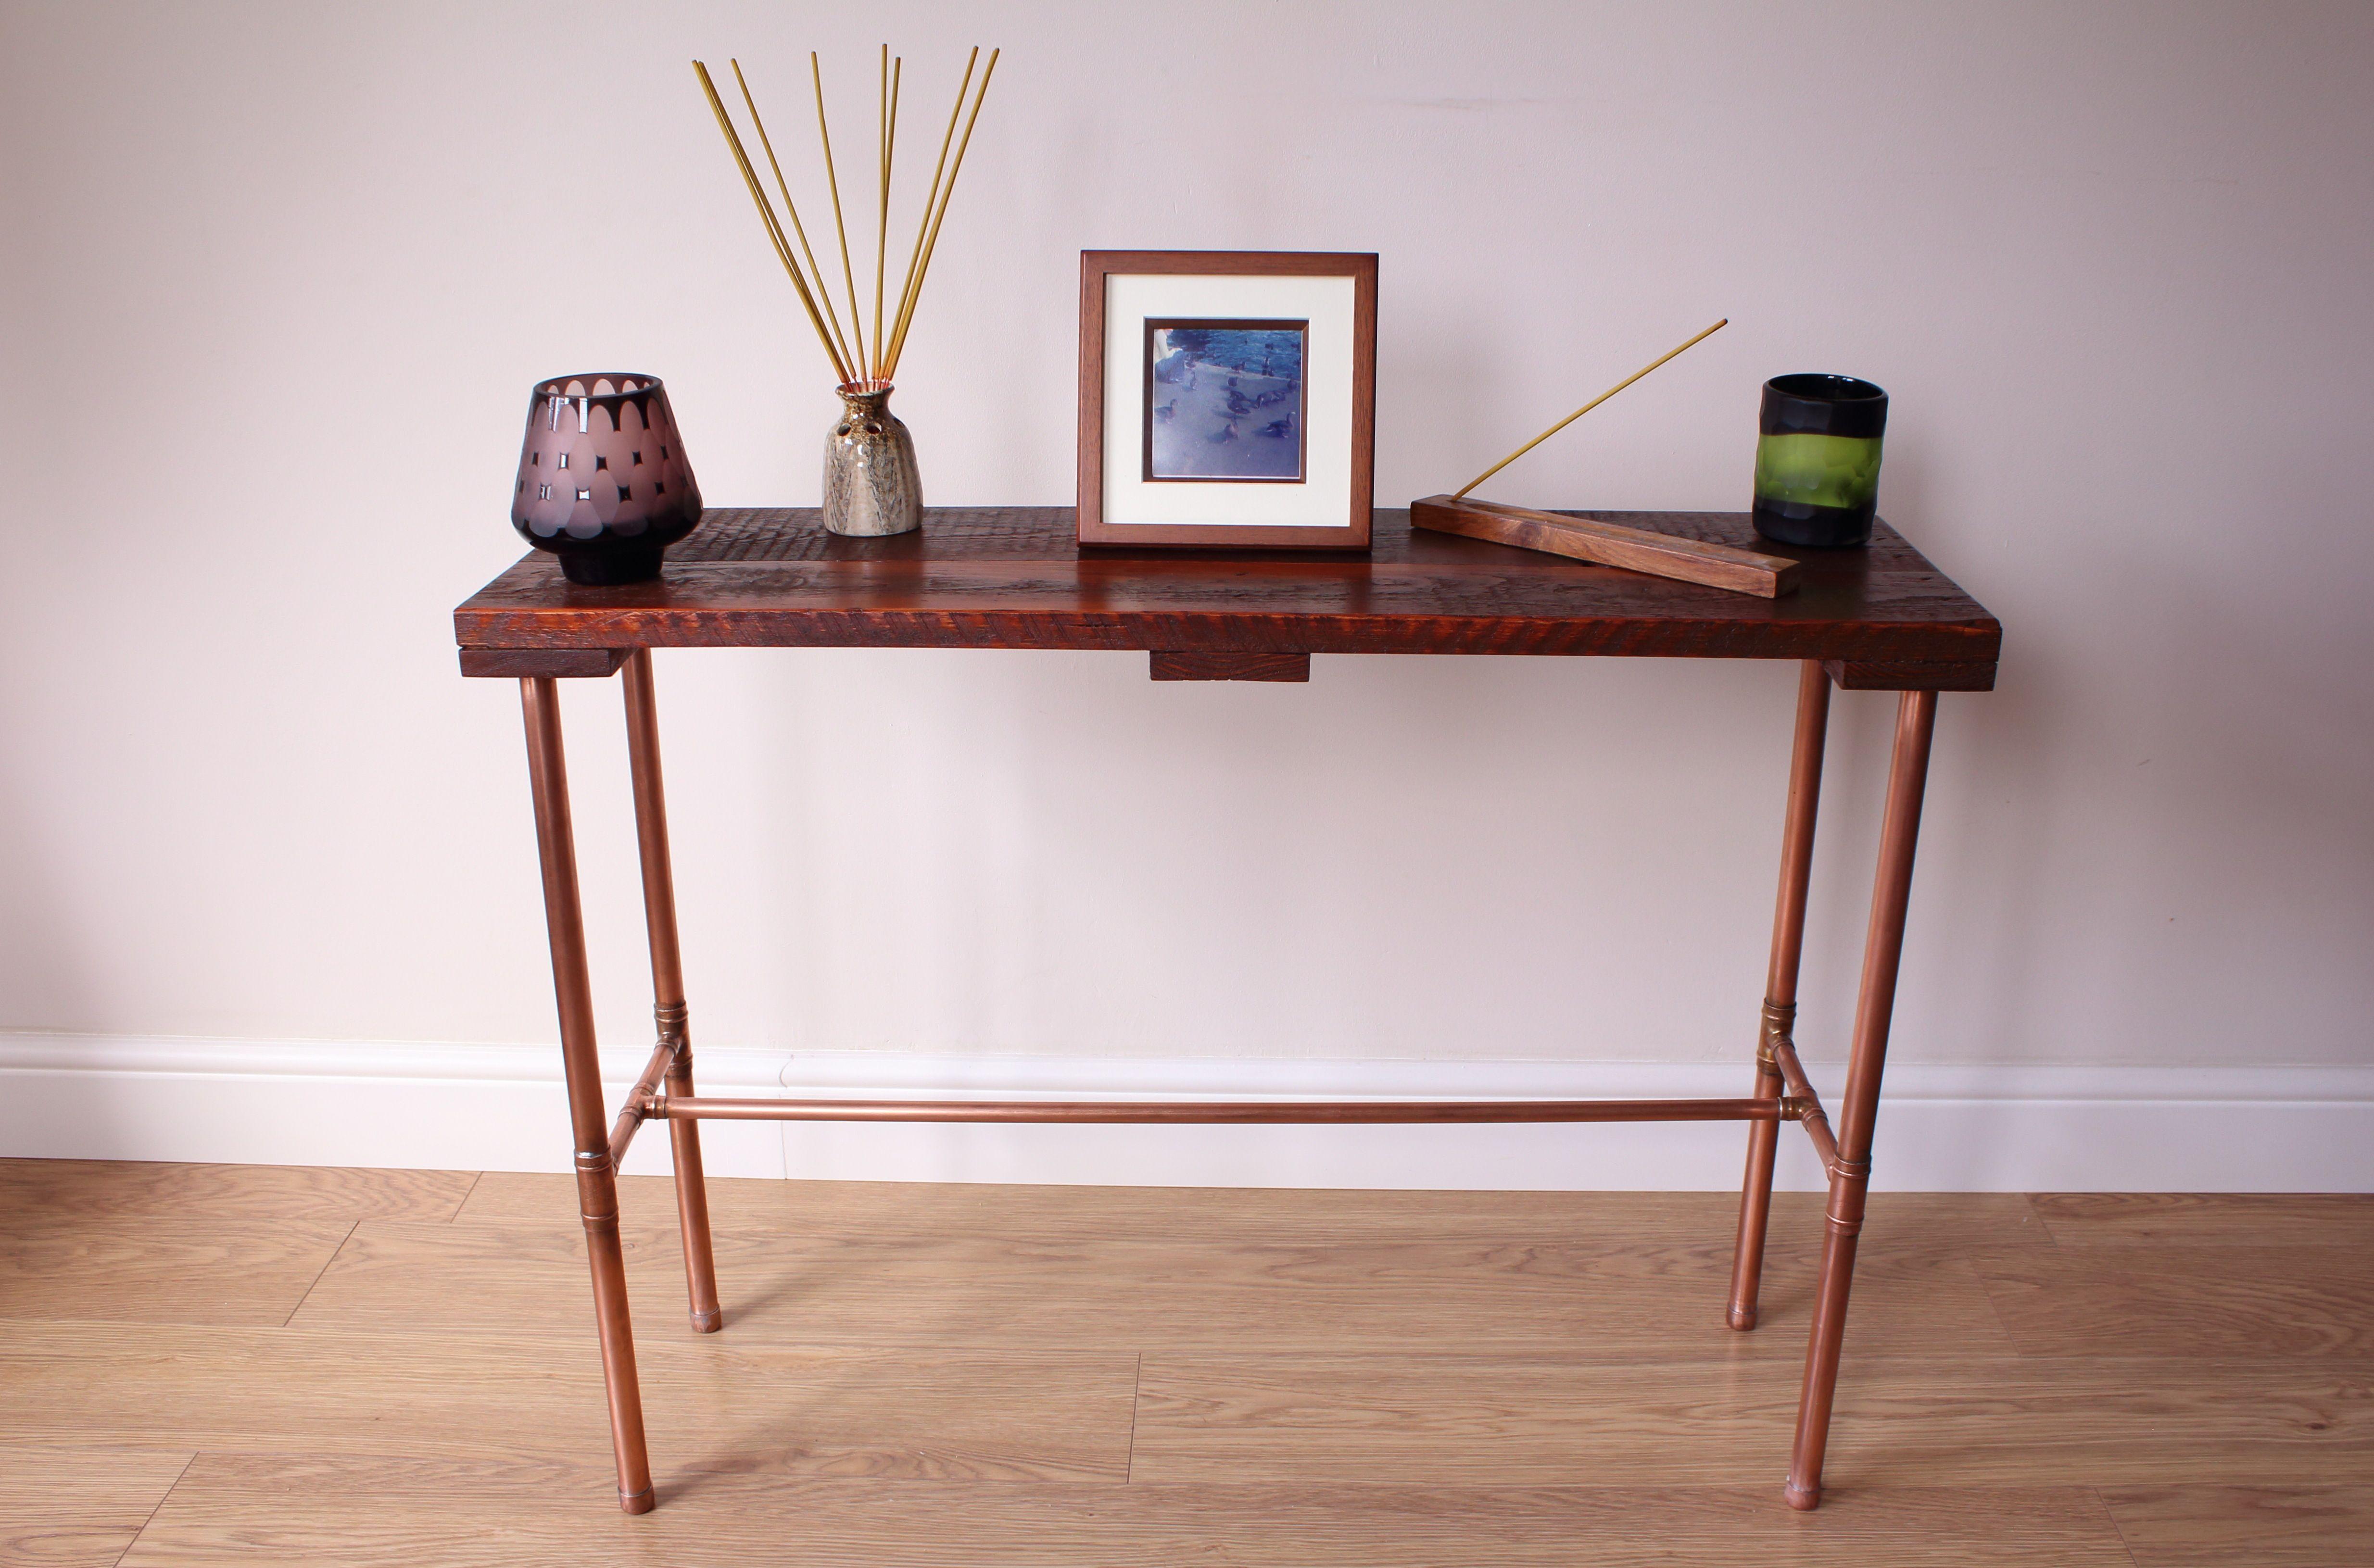 Ace Furniture Design Handmade Unique Vintage Upcycled